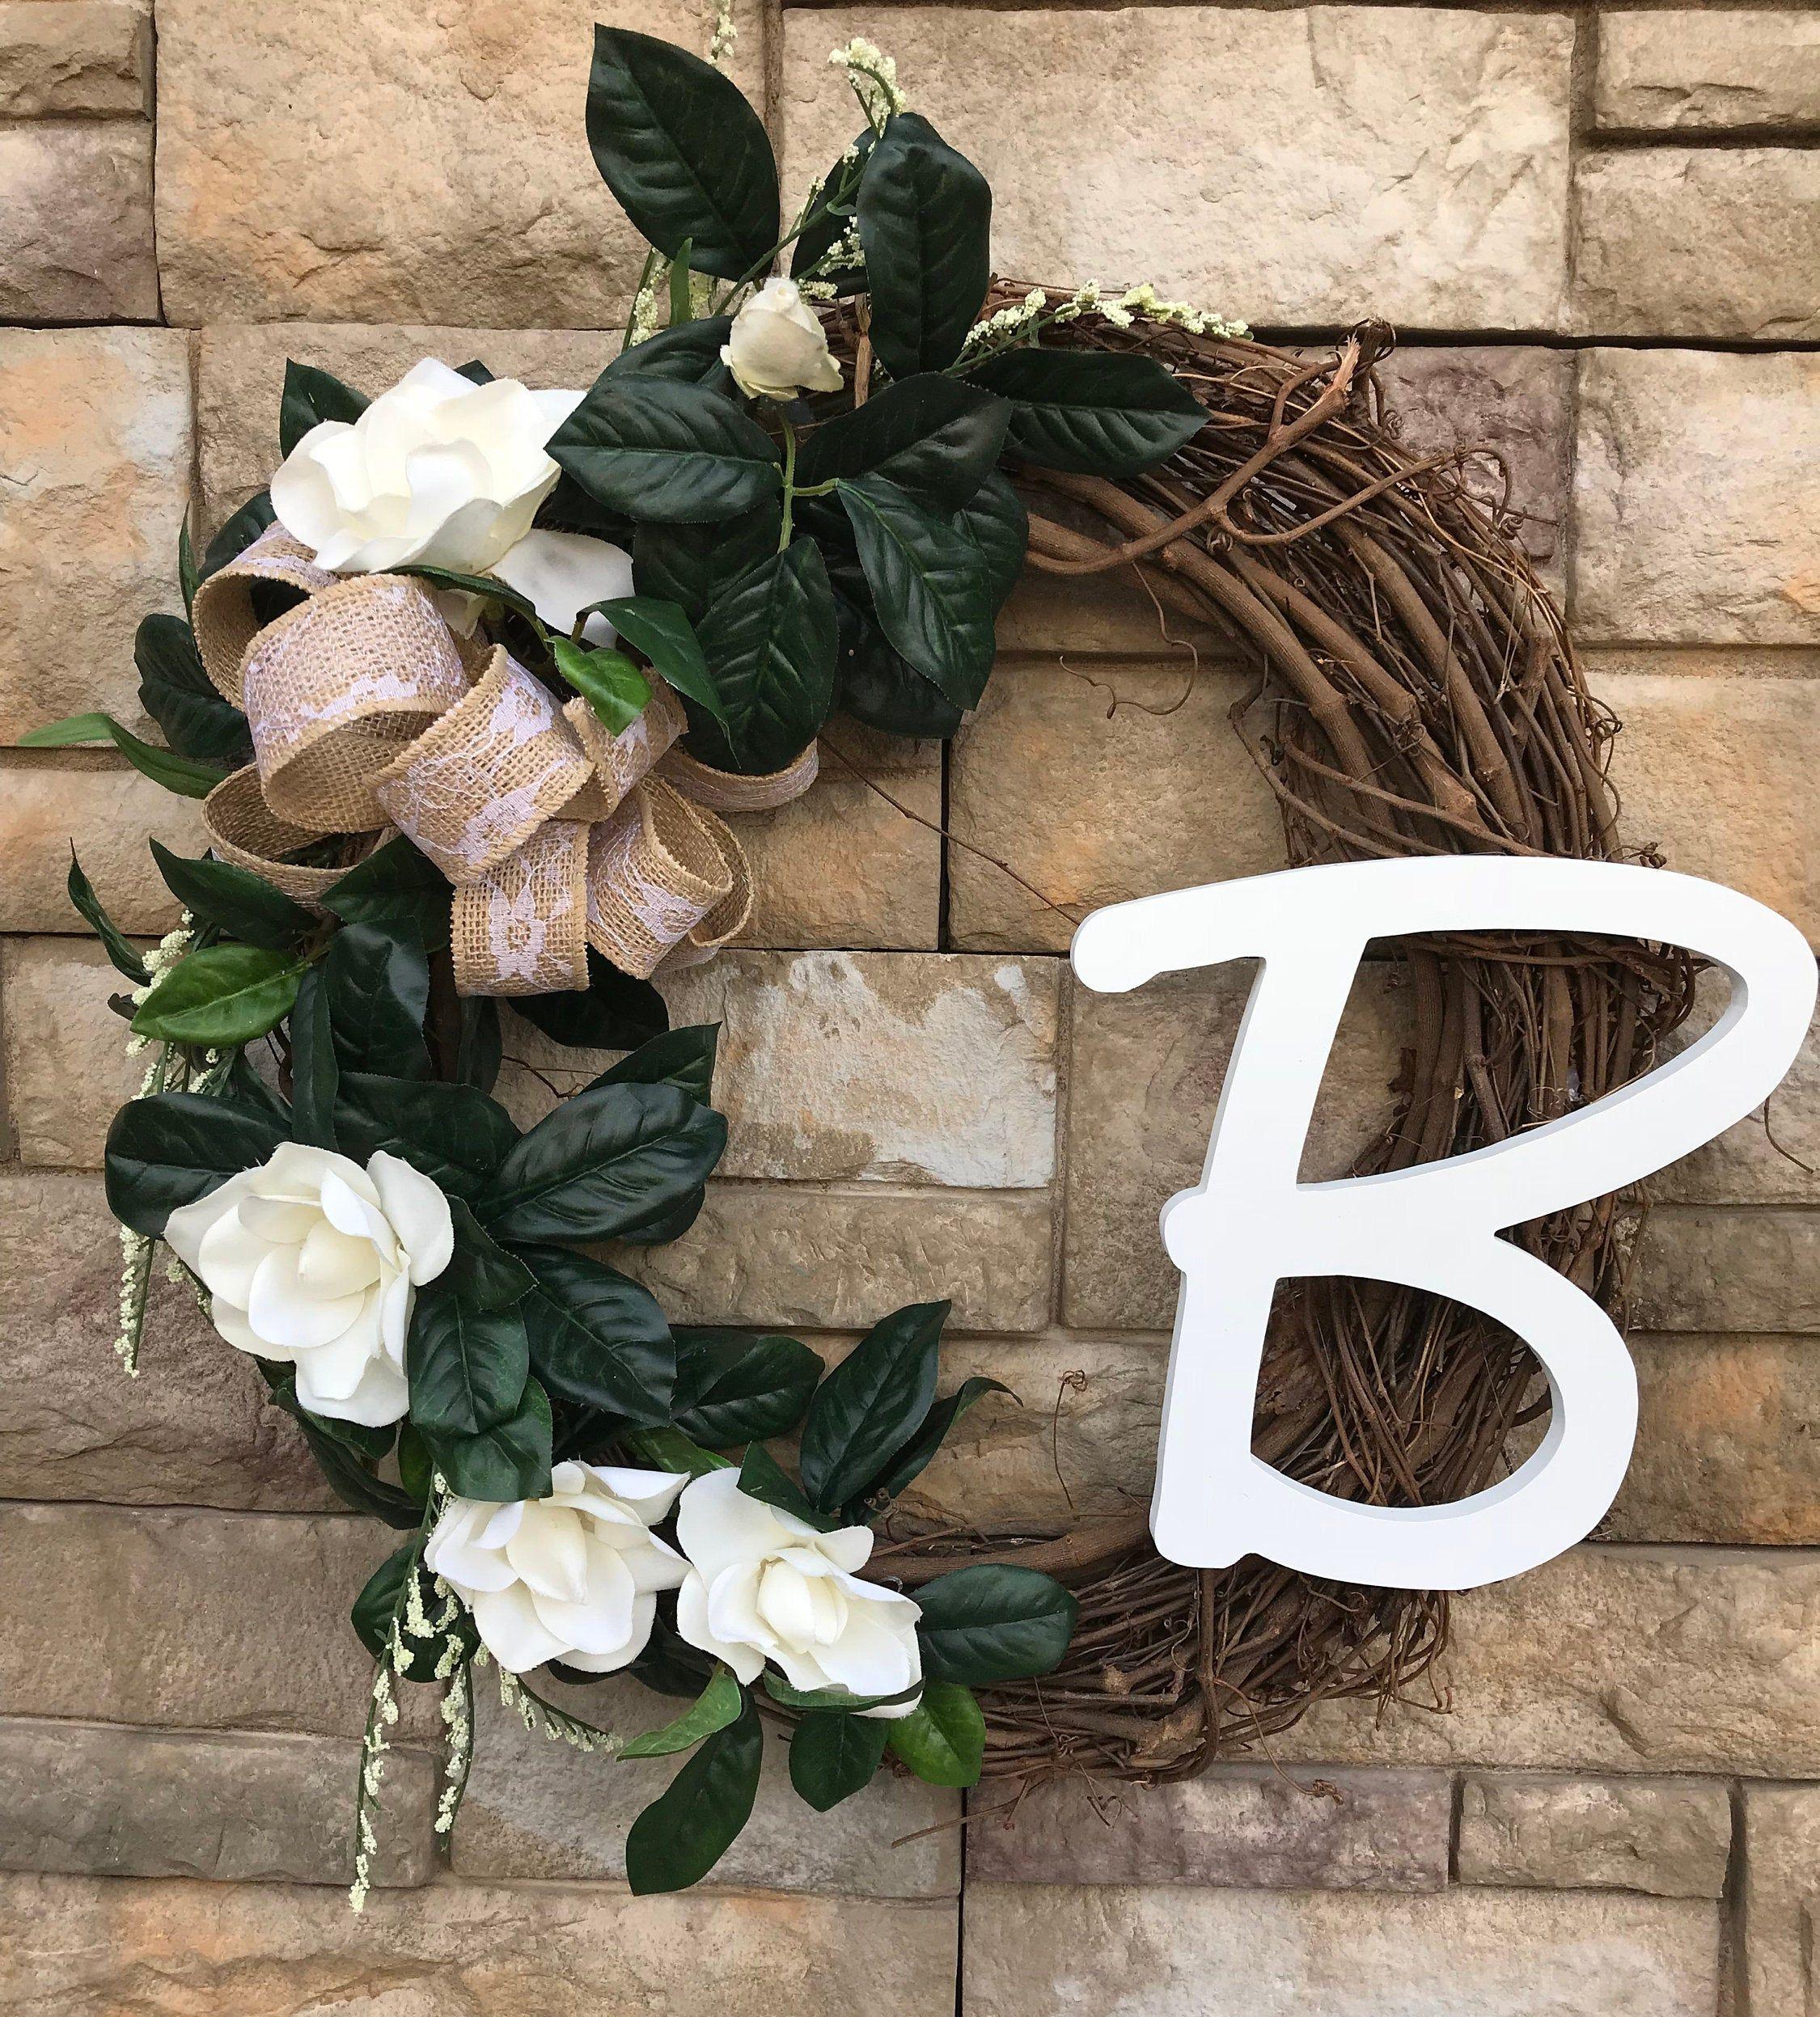 Photo of CAN'T CUSTOMIZE-Large Monogram Magnolia Wrerath-J-M-S-B-Available-Large Silk Magnolia Wreath-Personalized Monogram Wreath-Magnolia Decor